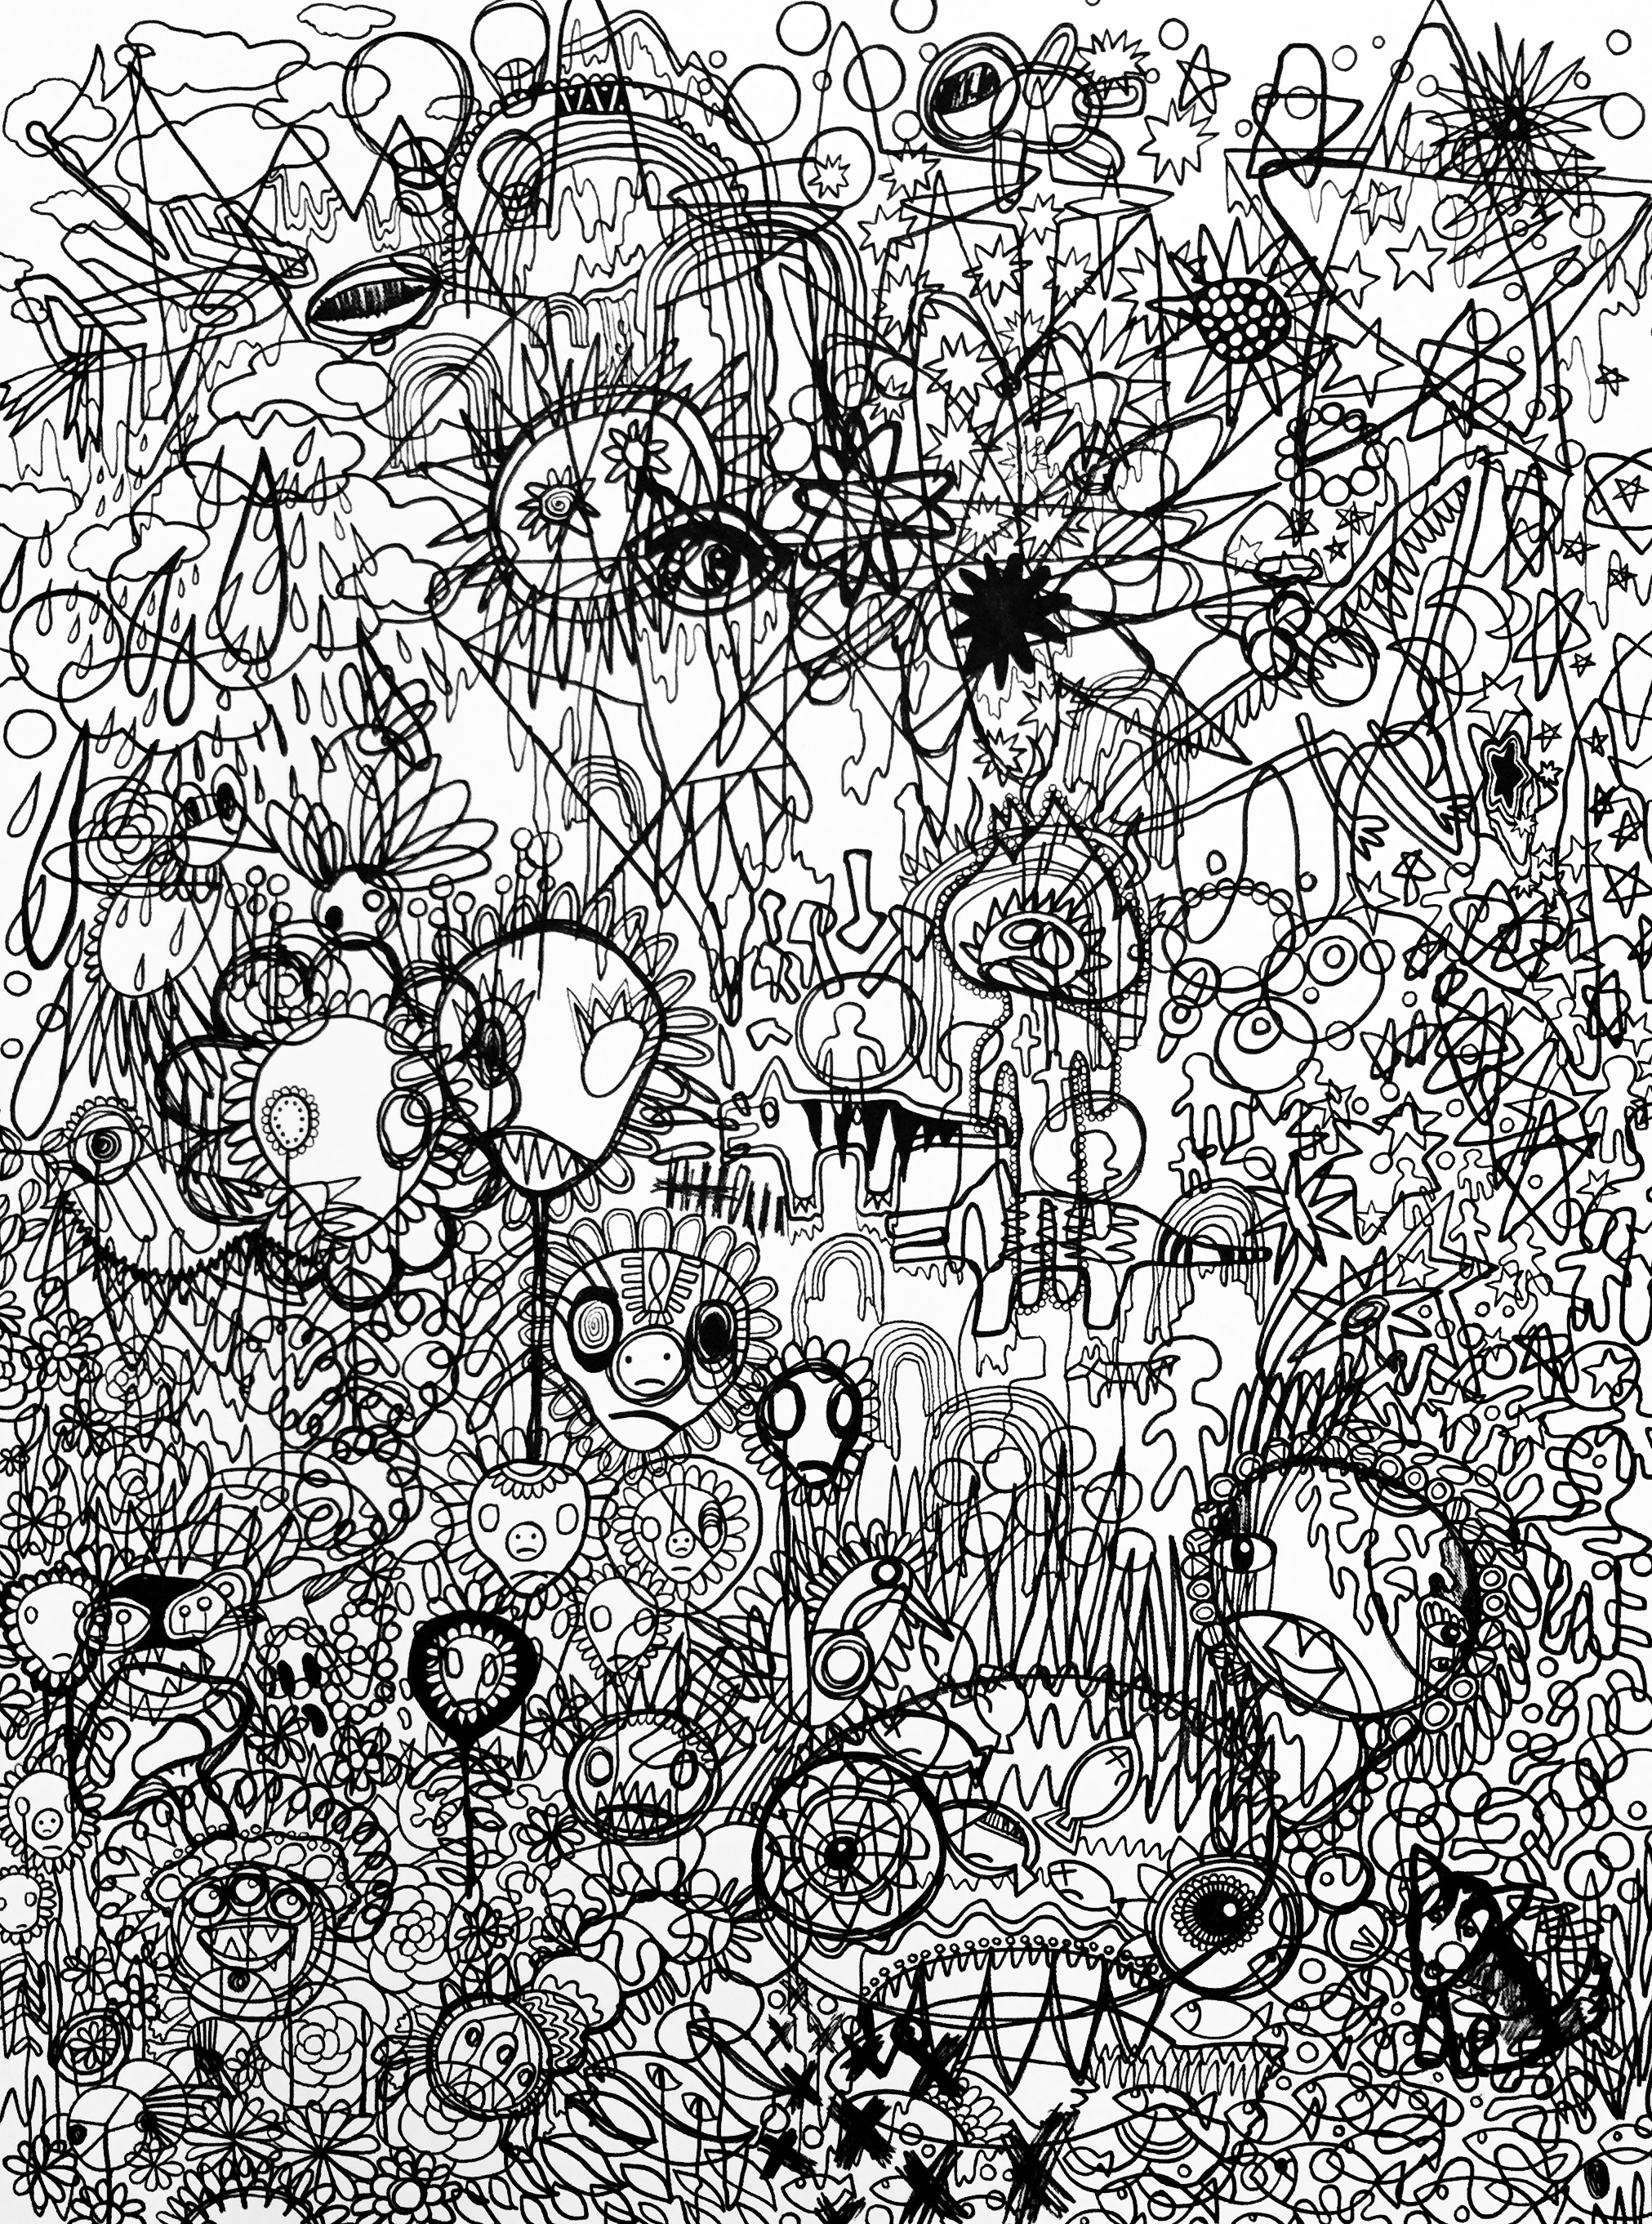 Dystopian Garden